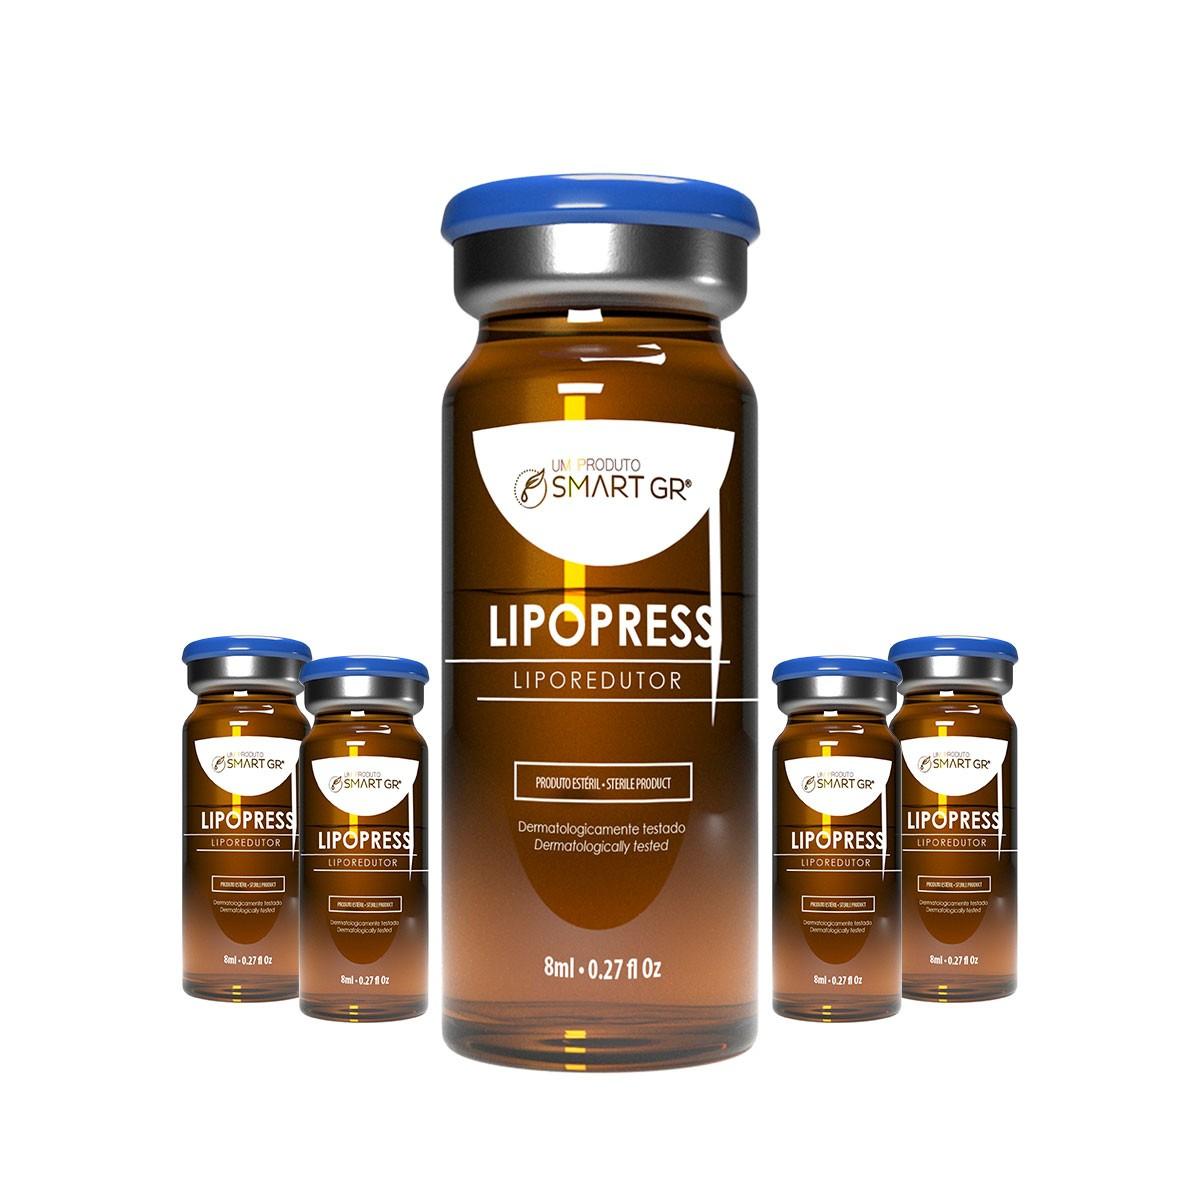 LIPOPRESS - LIPORREDUTOR - 5 FRASCOS DE 8 ML - SMART GR